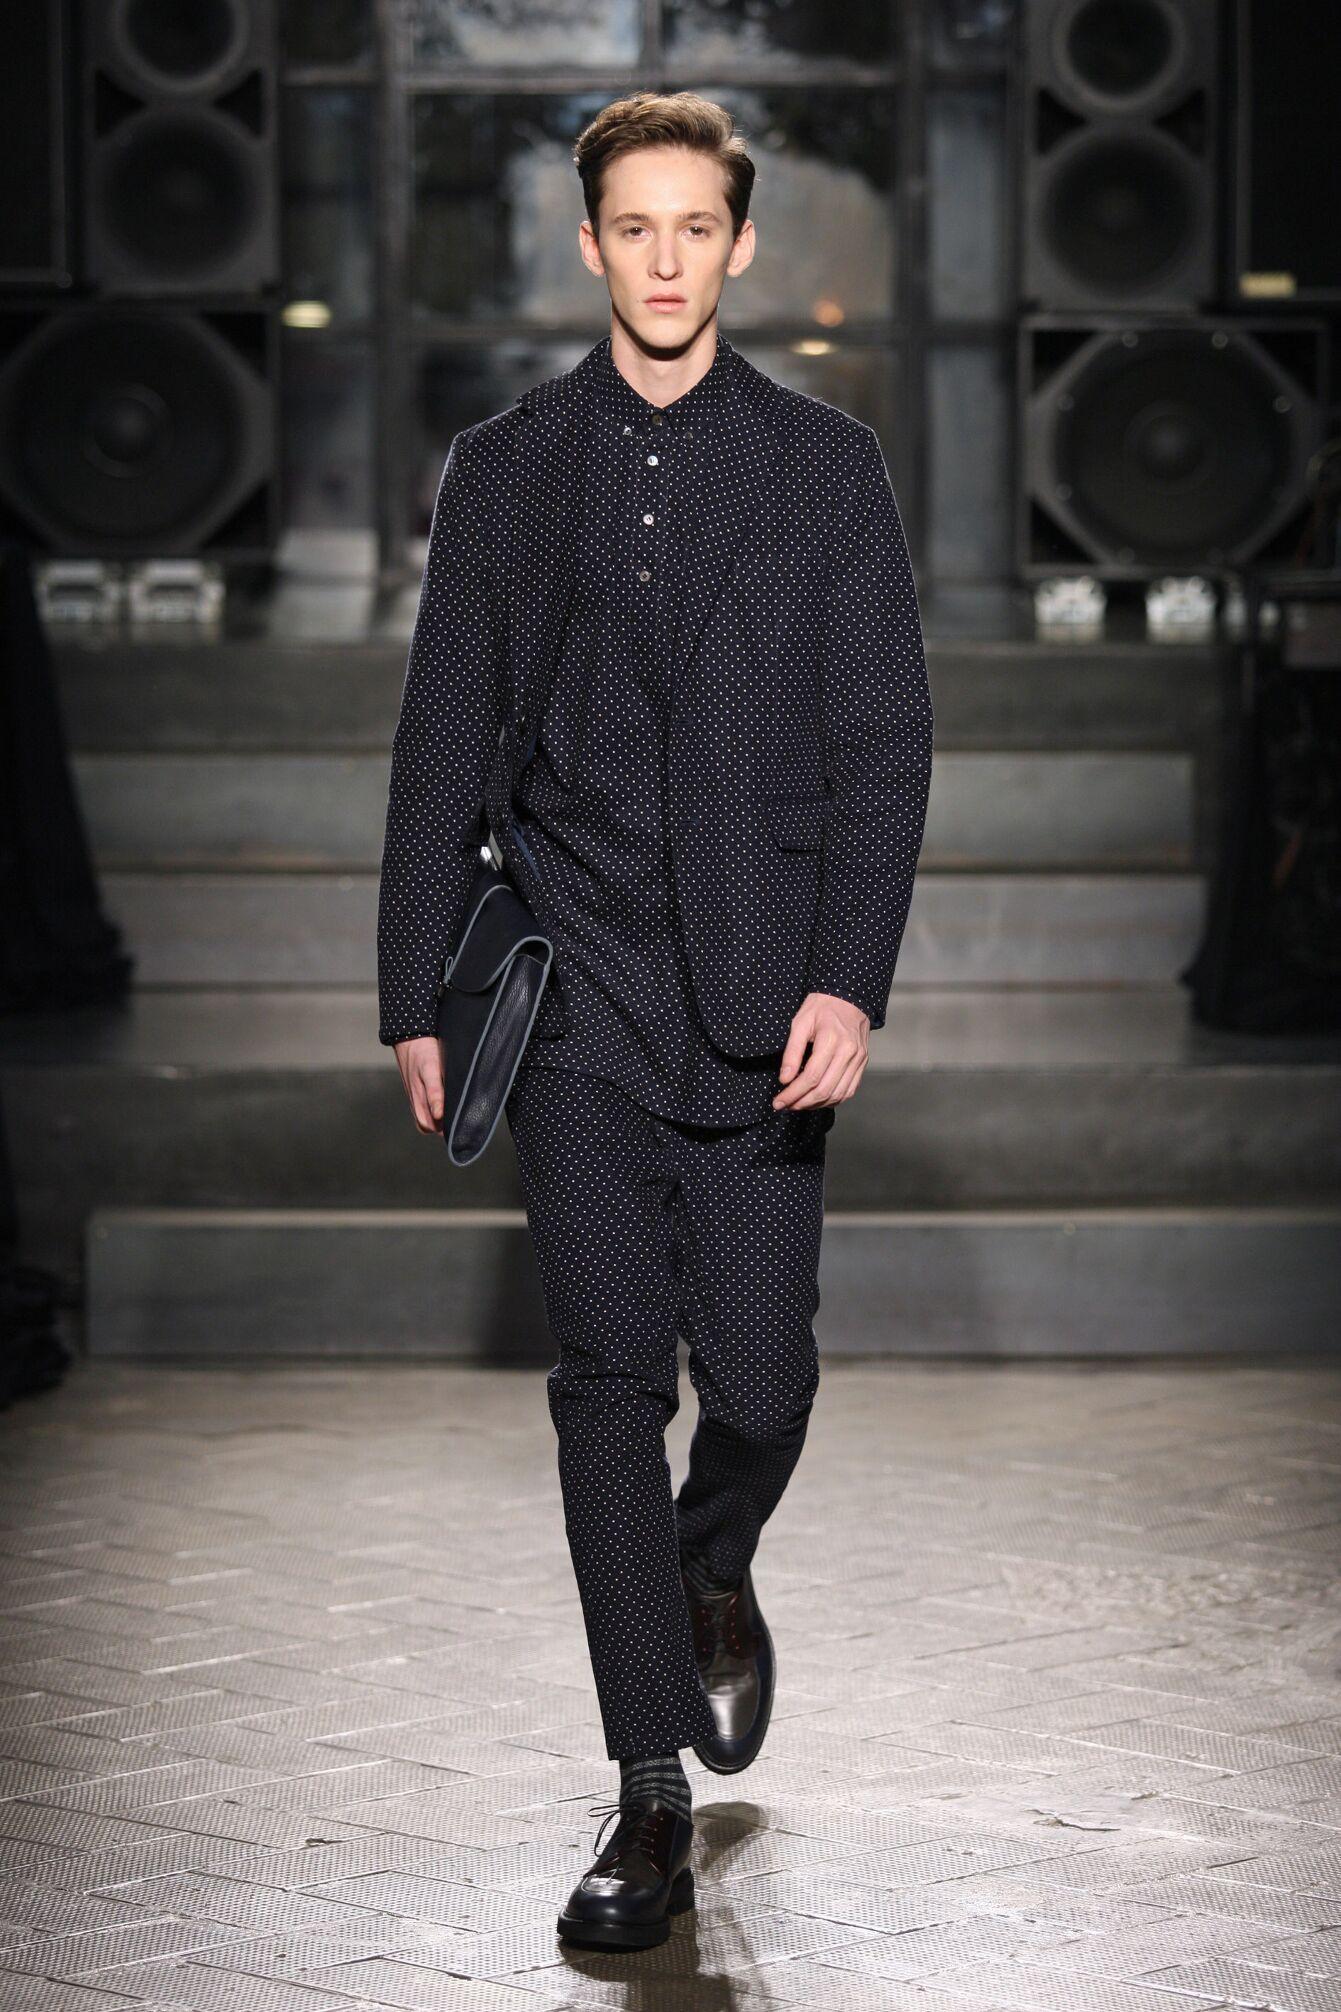 Fall Menswear Trends 2014 Antonio Marras